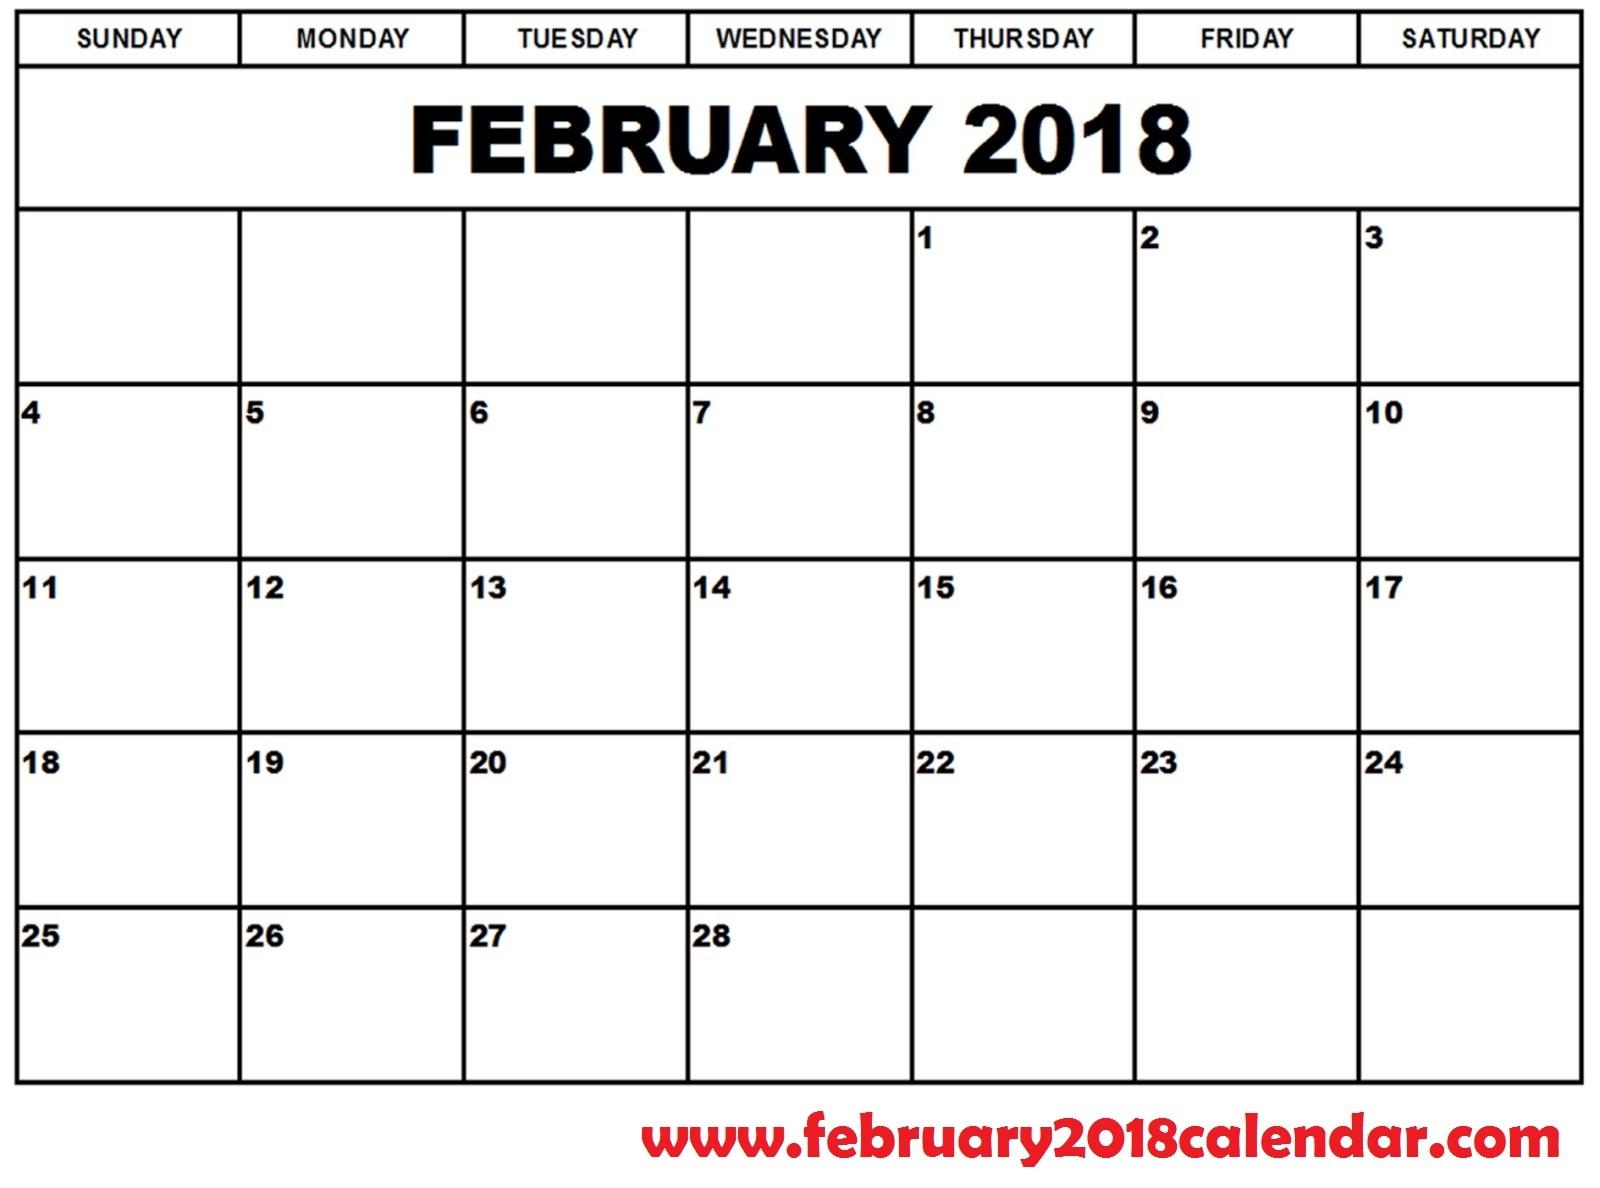 February 2018 Calendar Printable Template Pdf With Holidays Usa Uk  Xjb